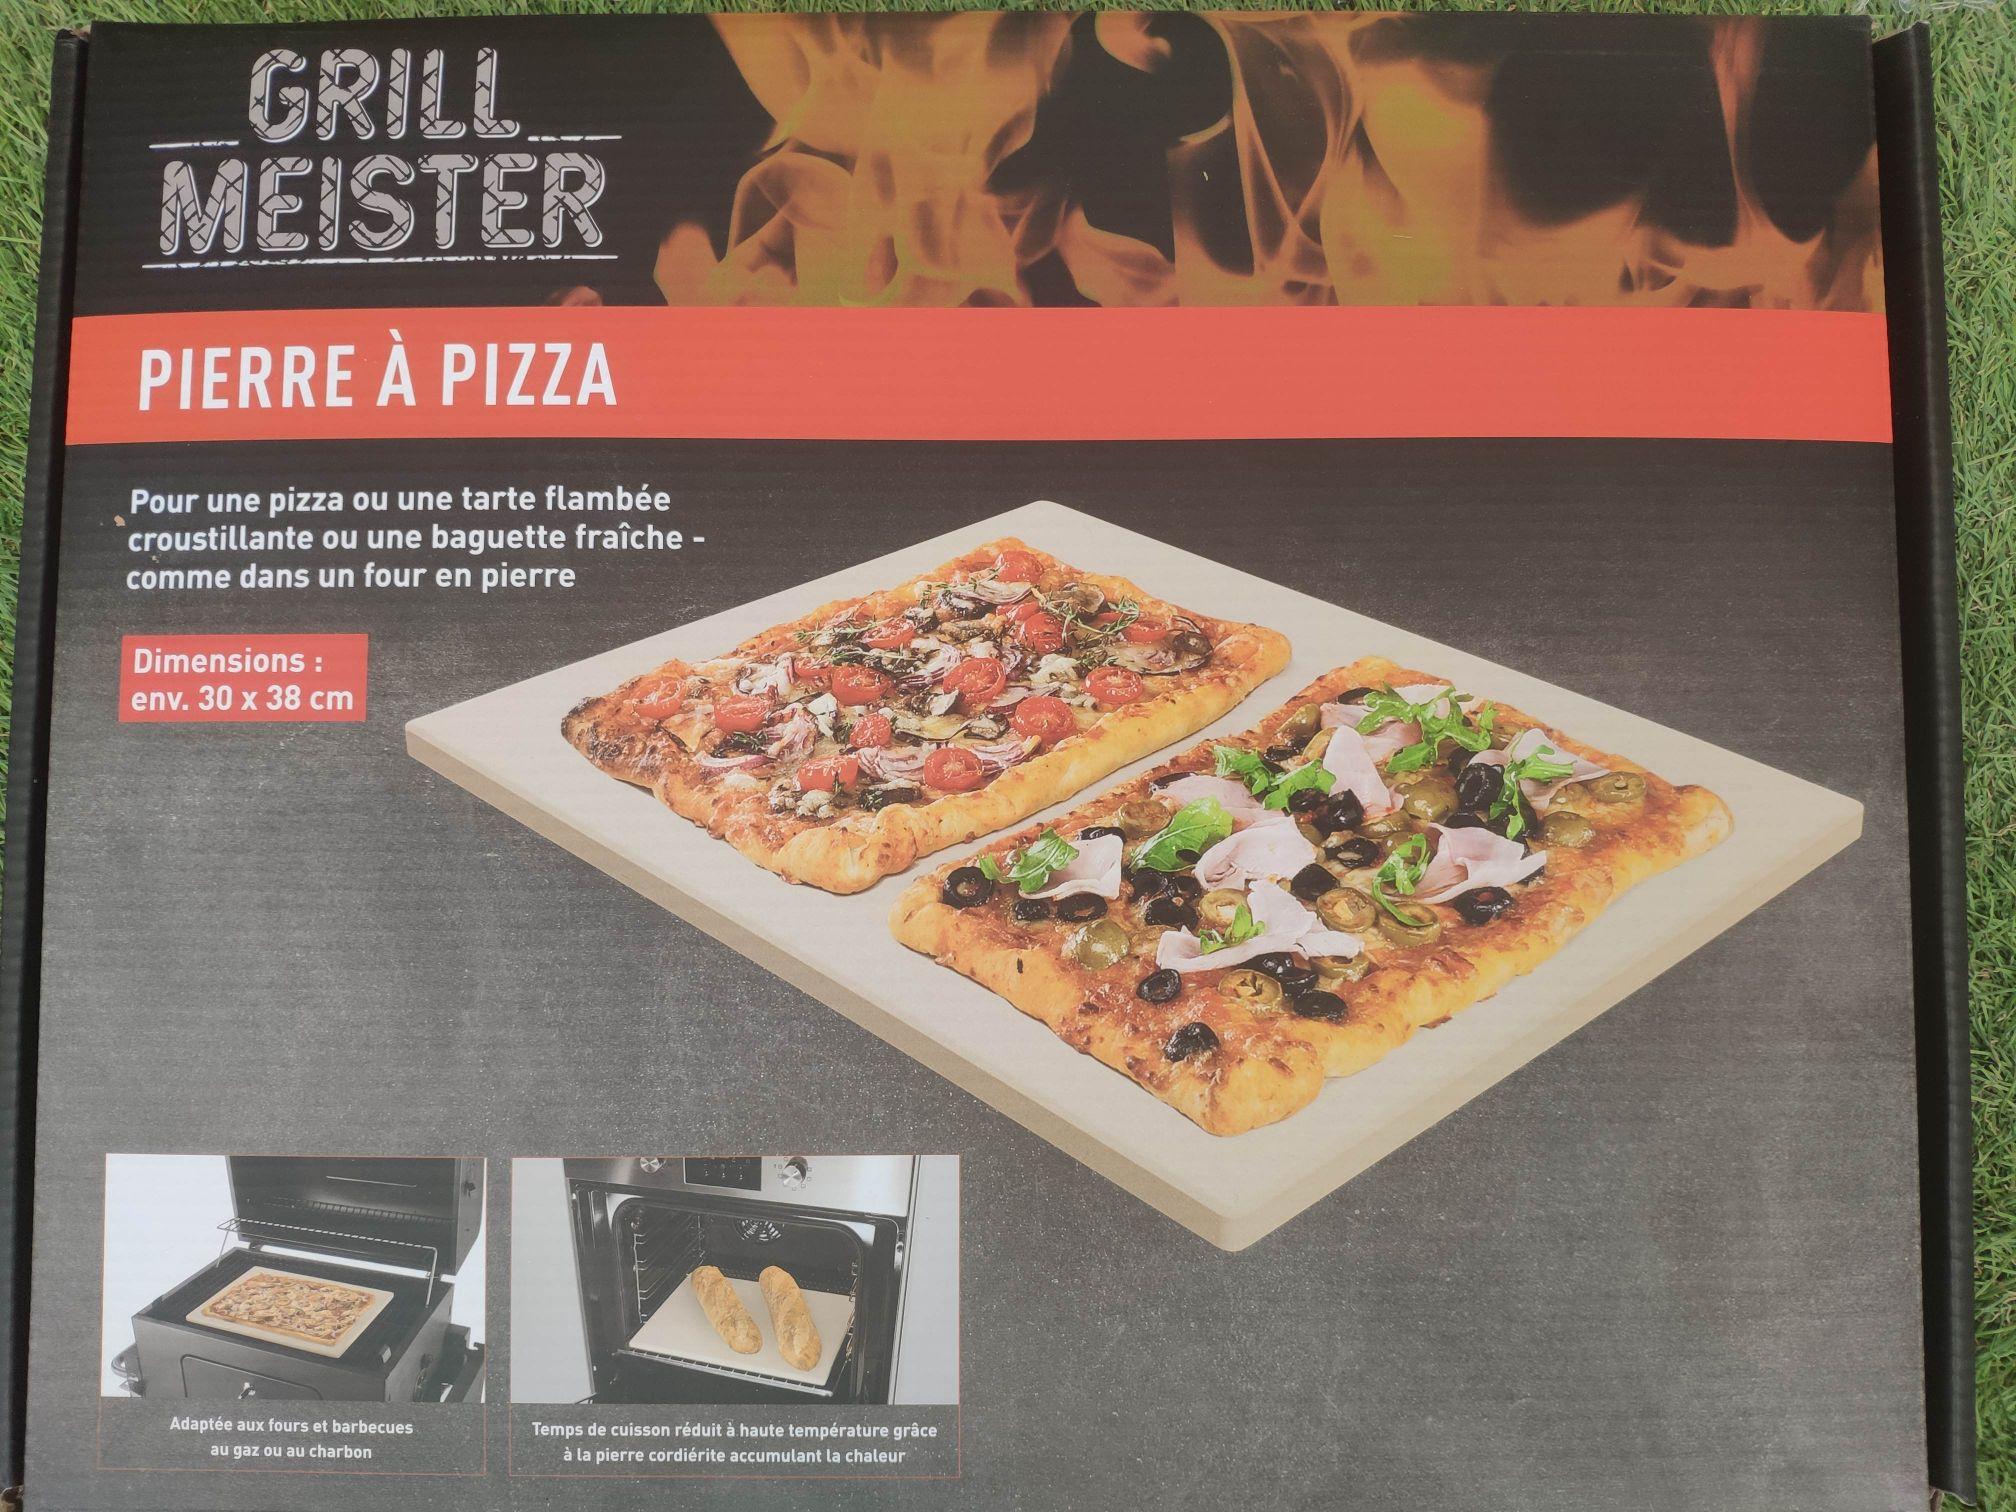 Pierre à pizza pour four et barbecue Grill Meister - Chambly et Persan (95)